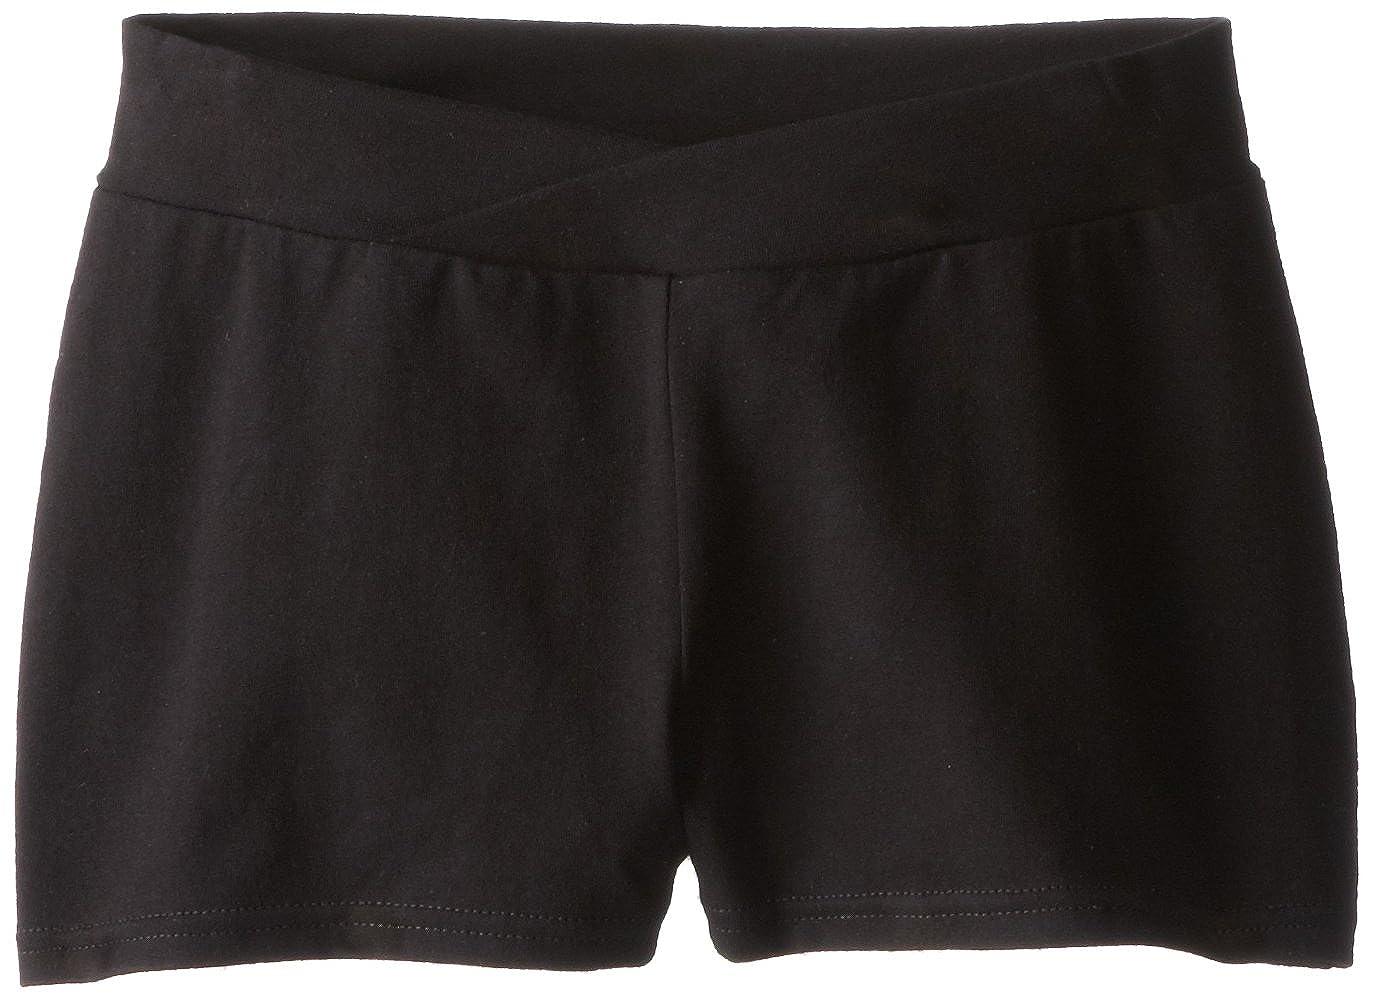 210a46a04b Amazon.com: Capezio Girls' Boyshort: Athletic Dance Shorts: Clothing